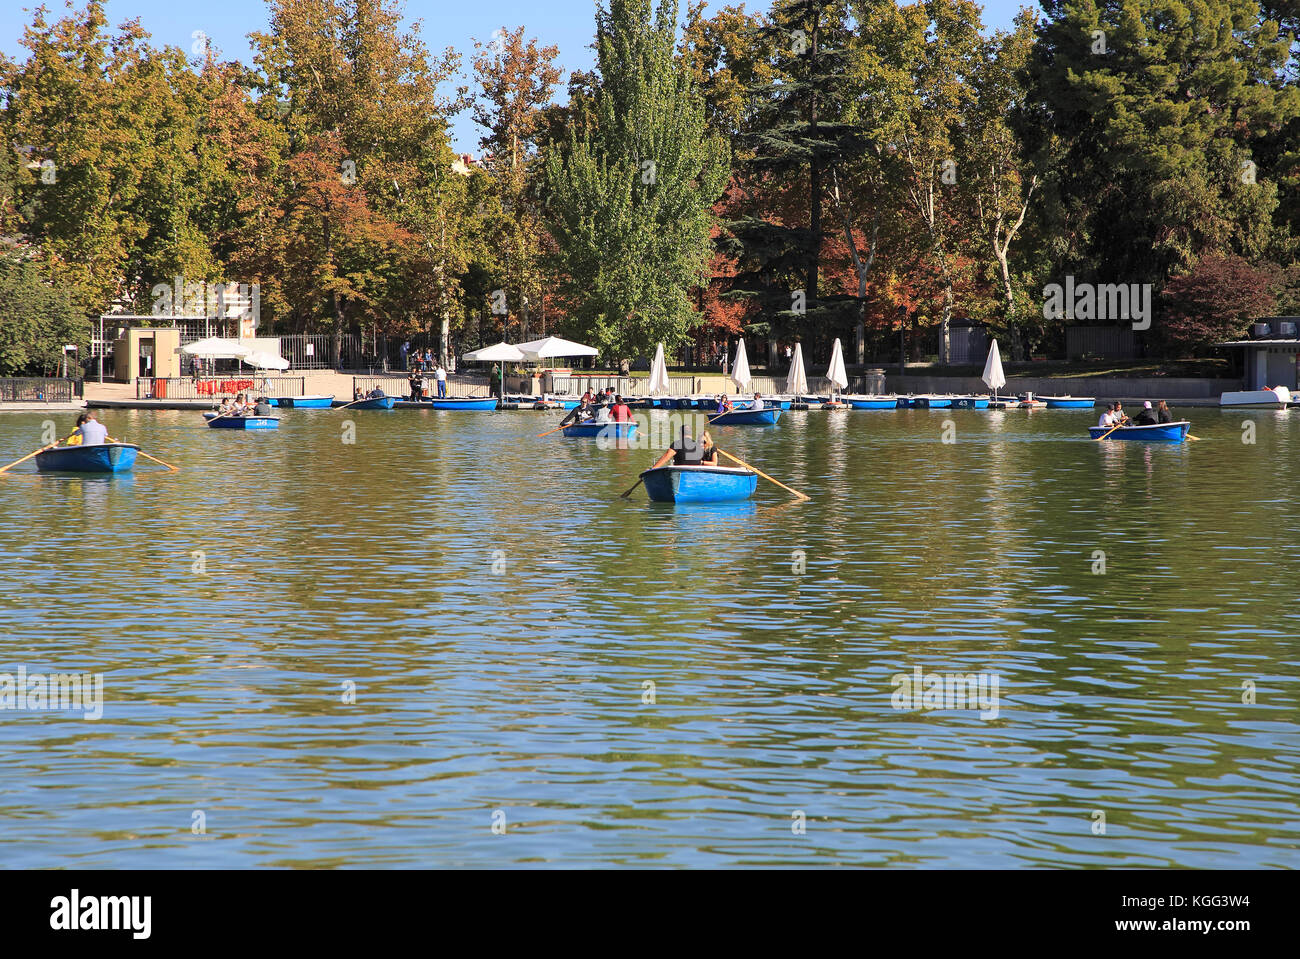 Rowing boats in boating pond of Estanque, El Retiro park, Madrid, Spain - Stock Image